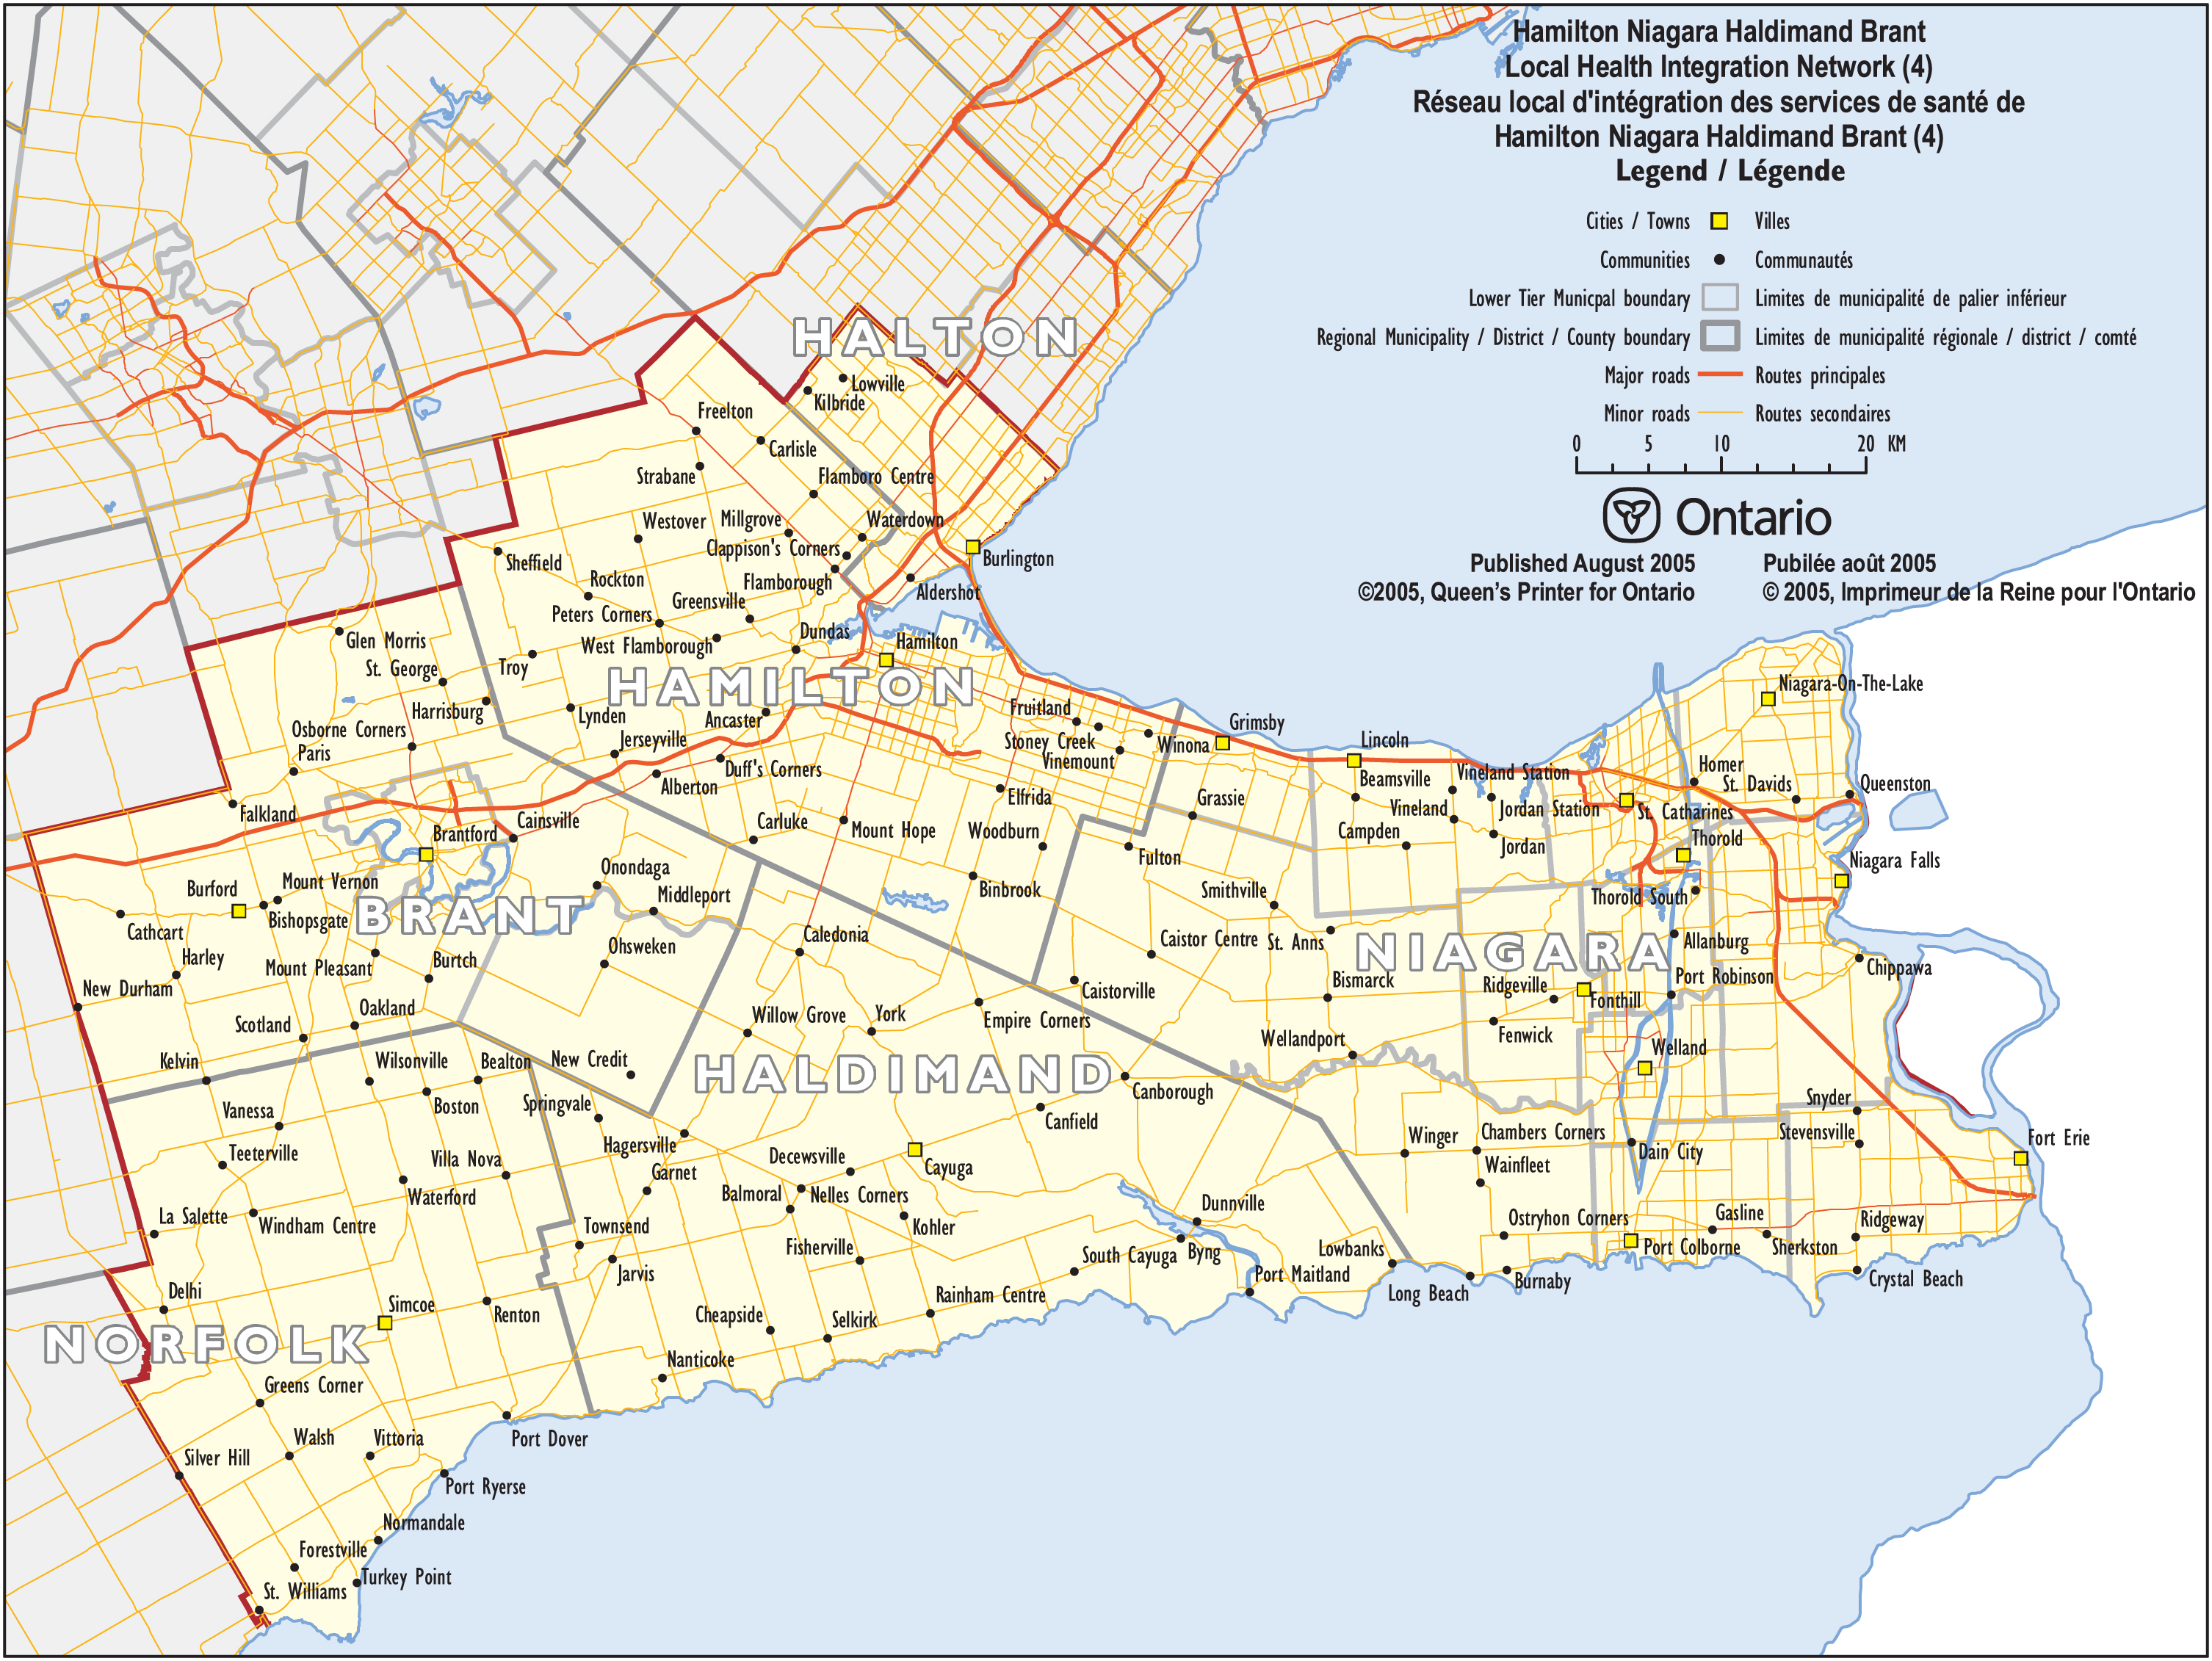 Services De Sant 233 Pour Hamilton Niagara Haldimand Brant